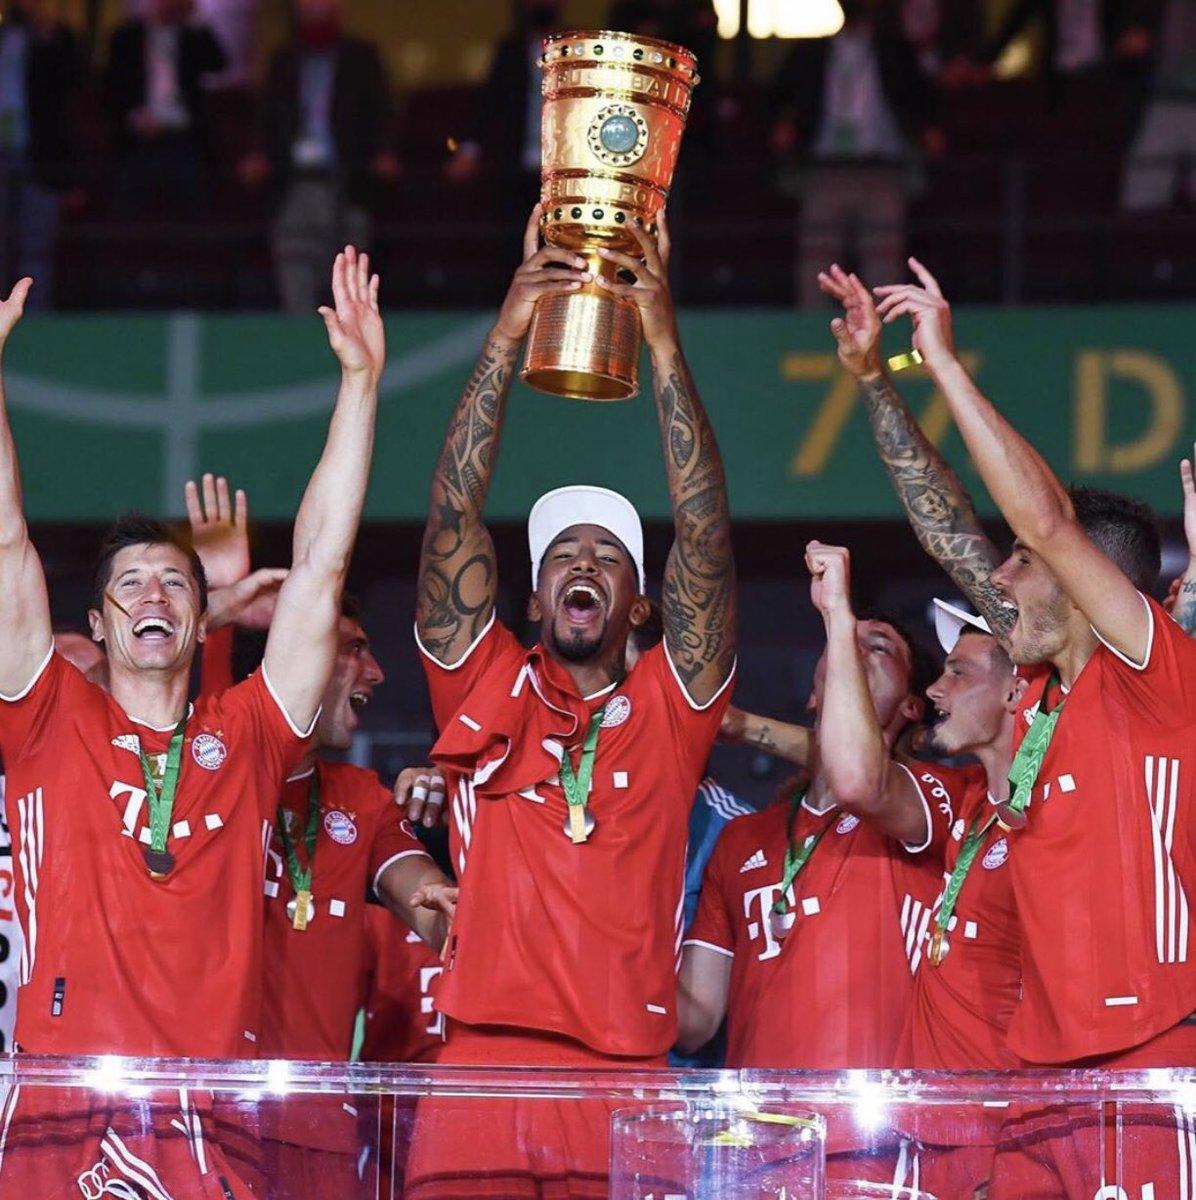 Good night, FC Bayern, double winners & eine extra gute Nacht an meine Lieblingsspieler. pic.twitter.com/KmyLf6DQQZ  by Katrin Figge